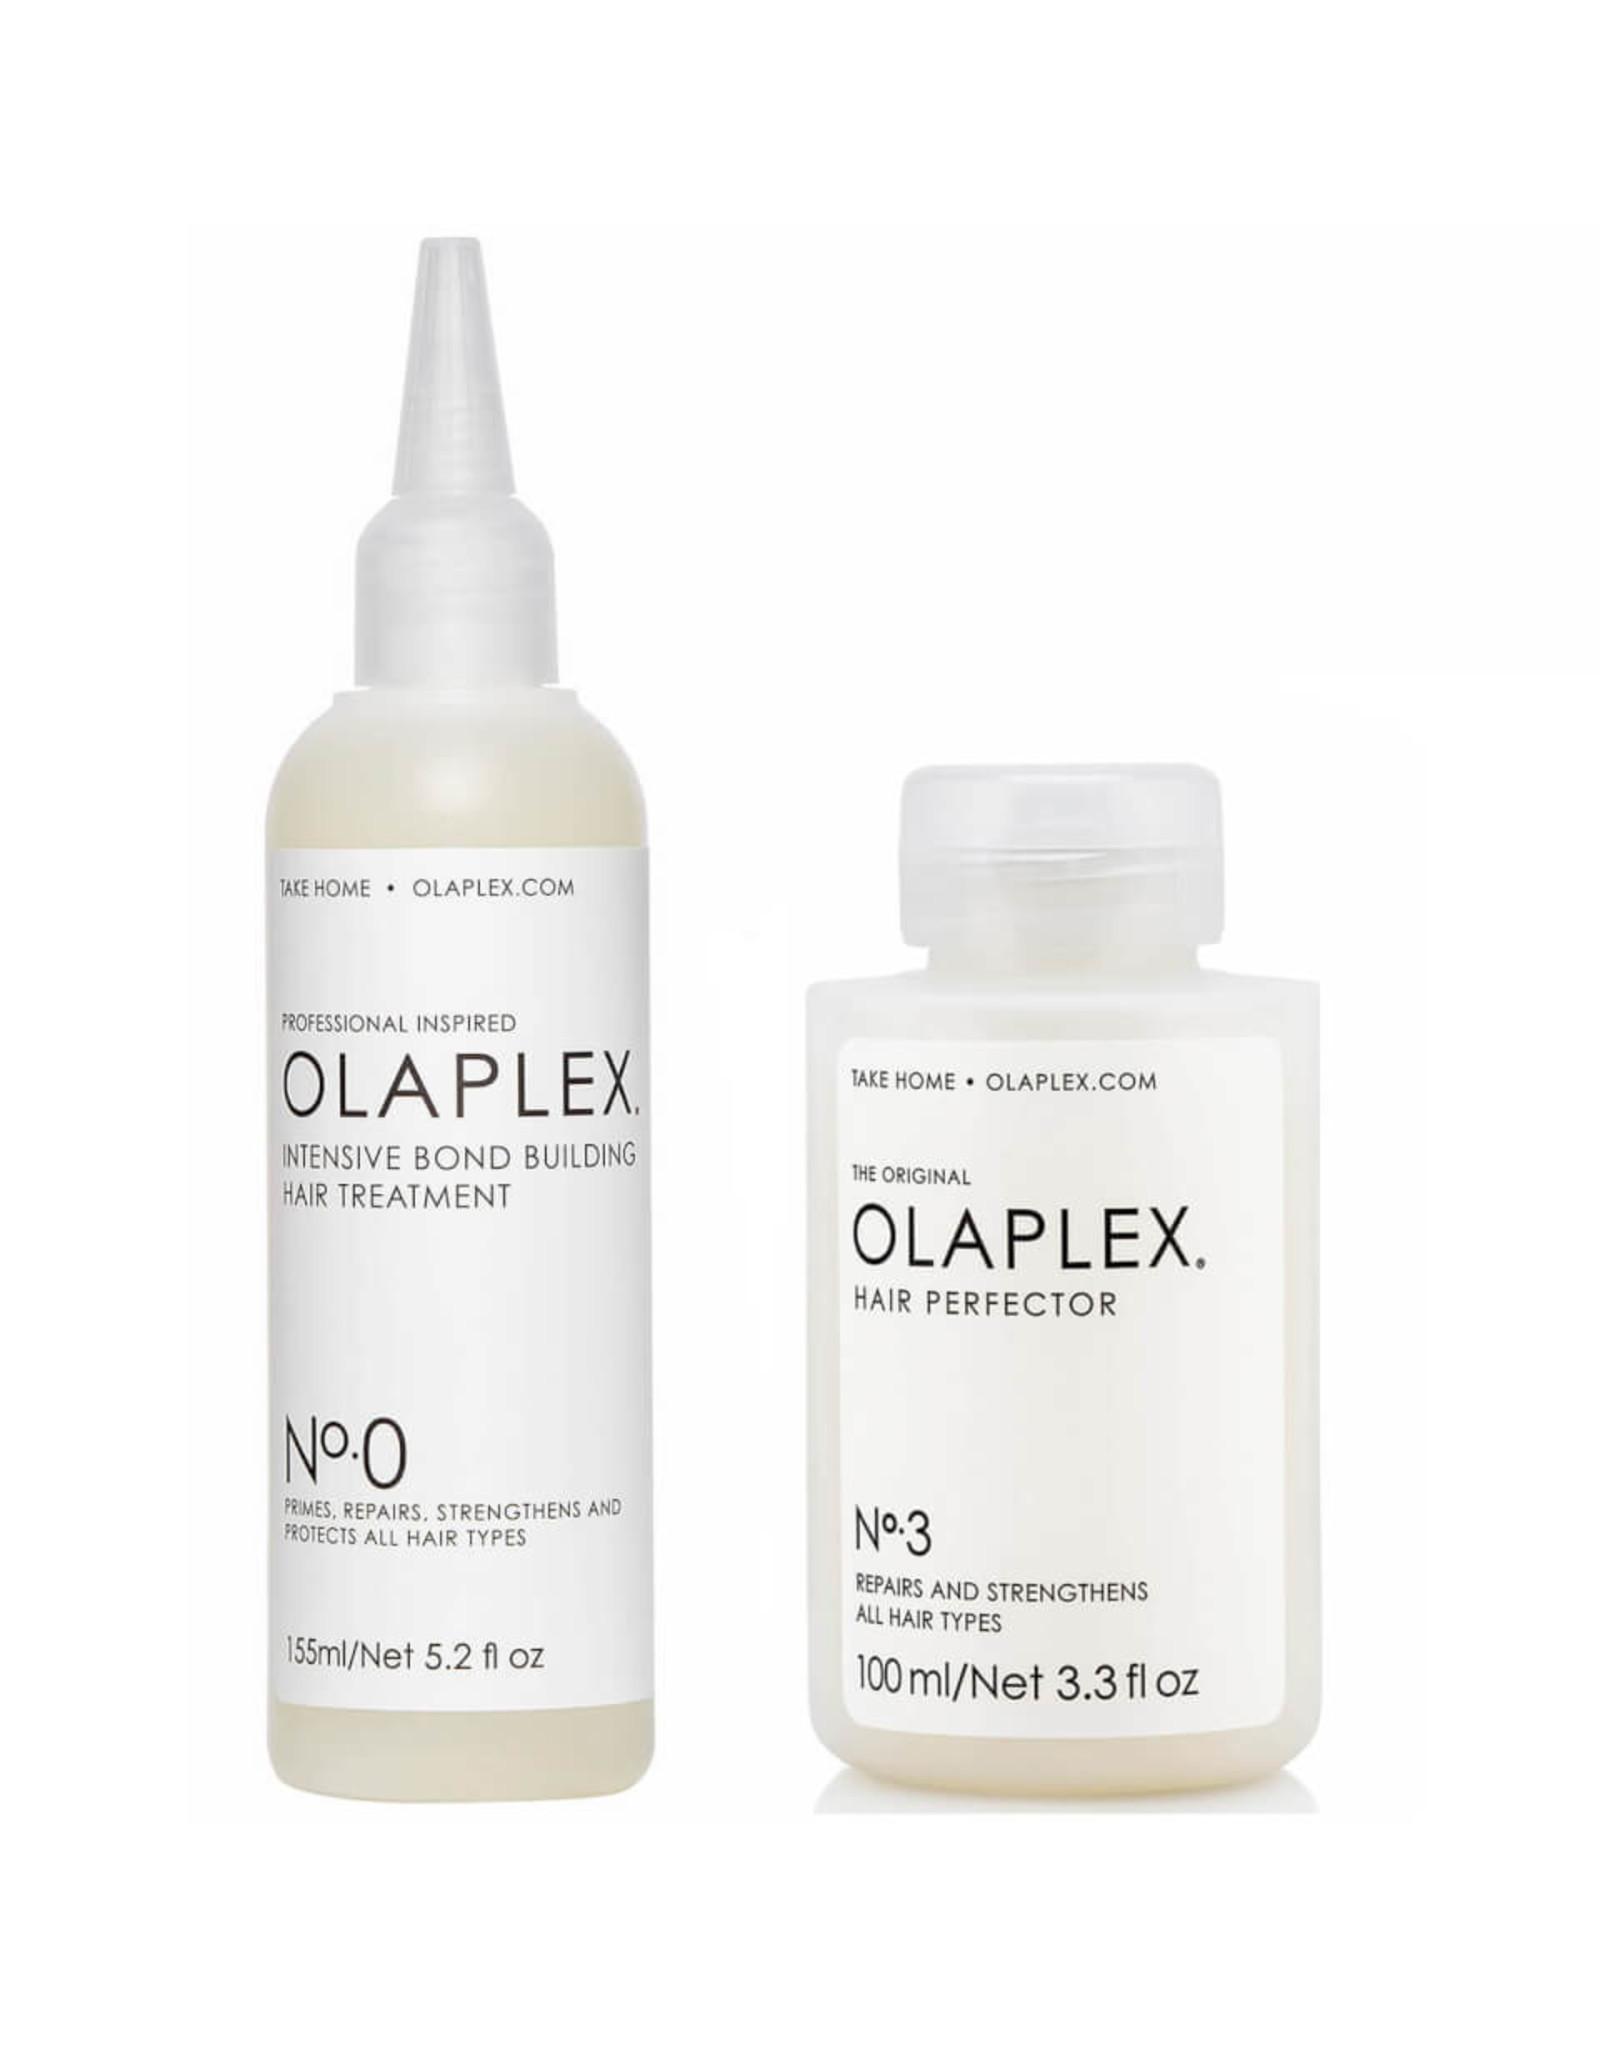 OLAPLEX SALON TREATMENT - HERSTELBEHANDELING OLAPLEX ®️